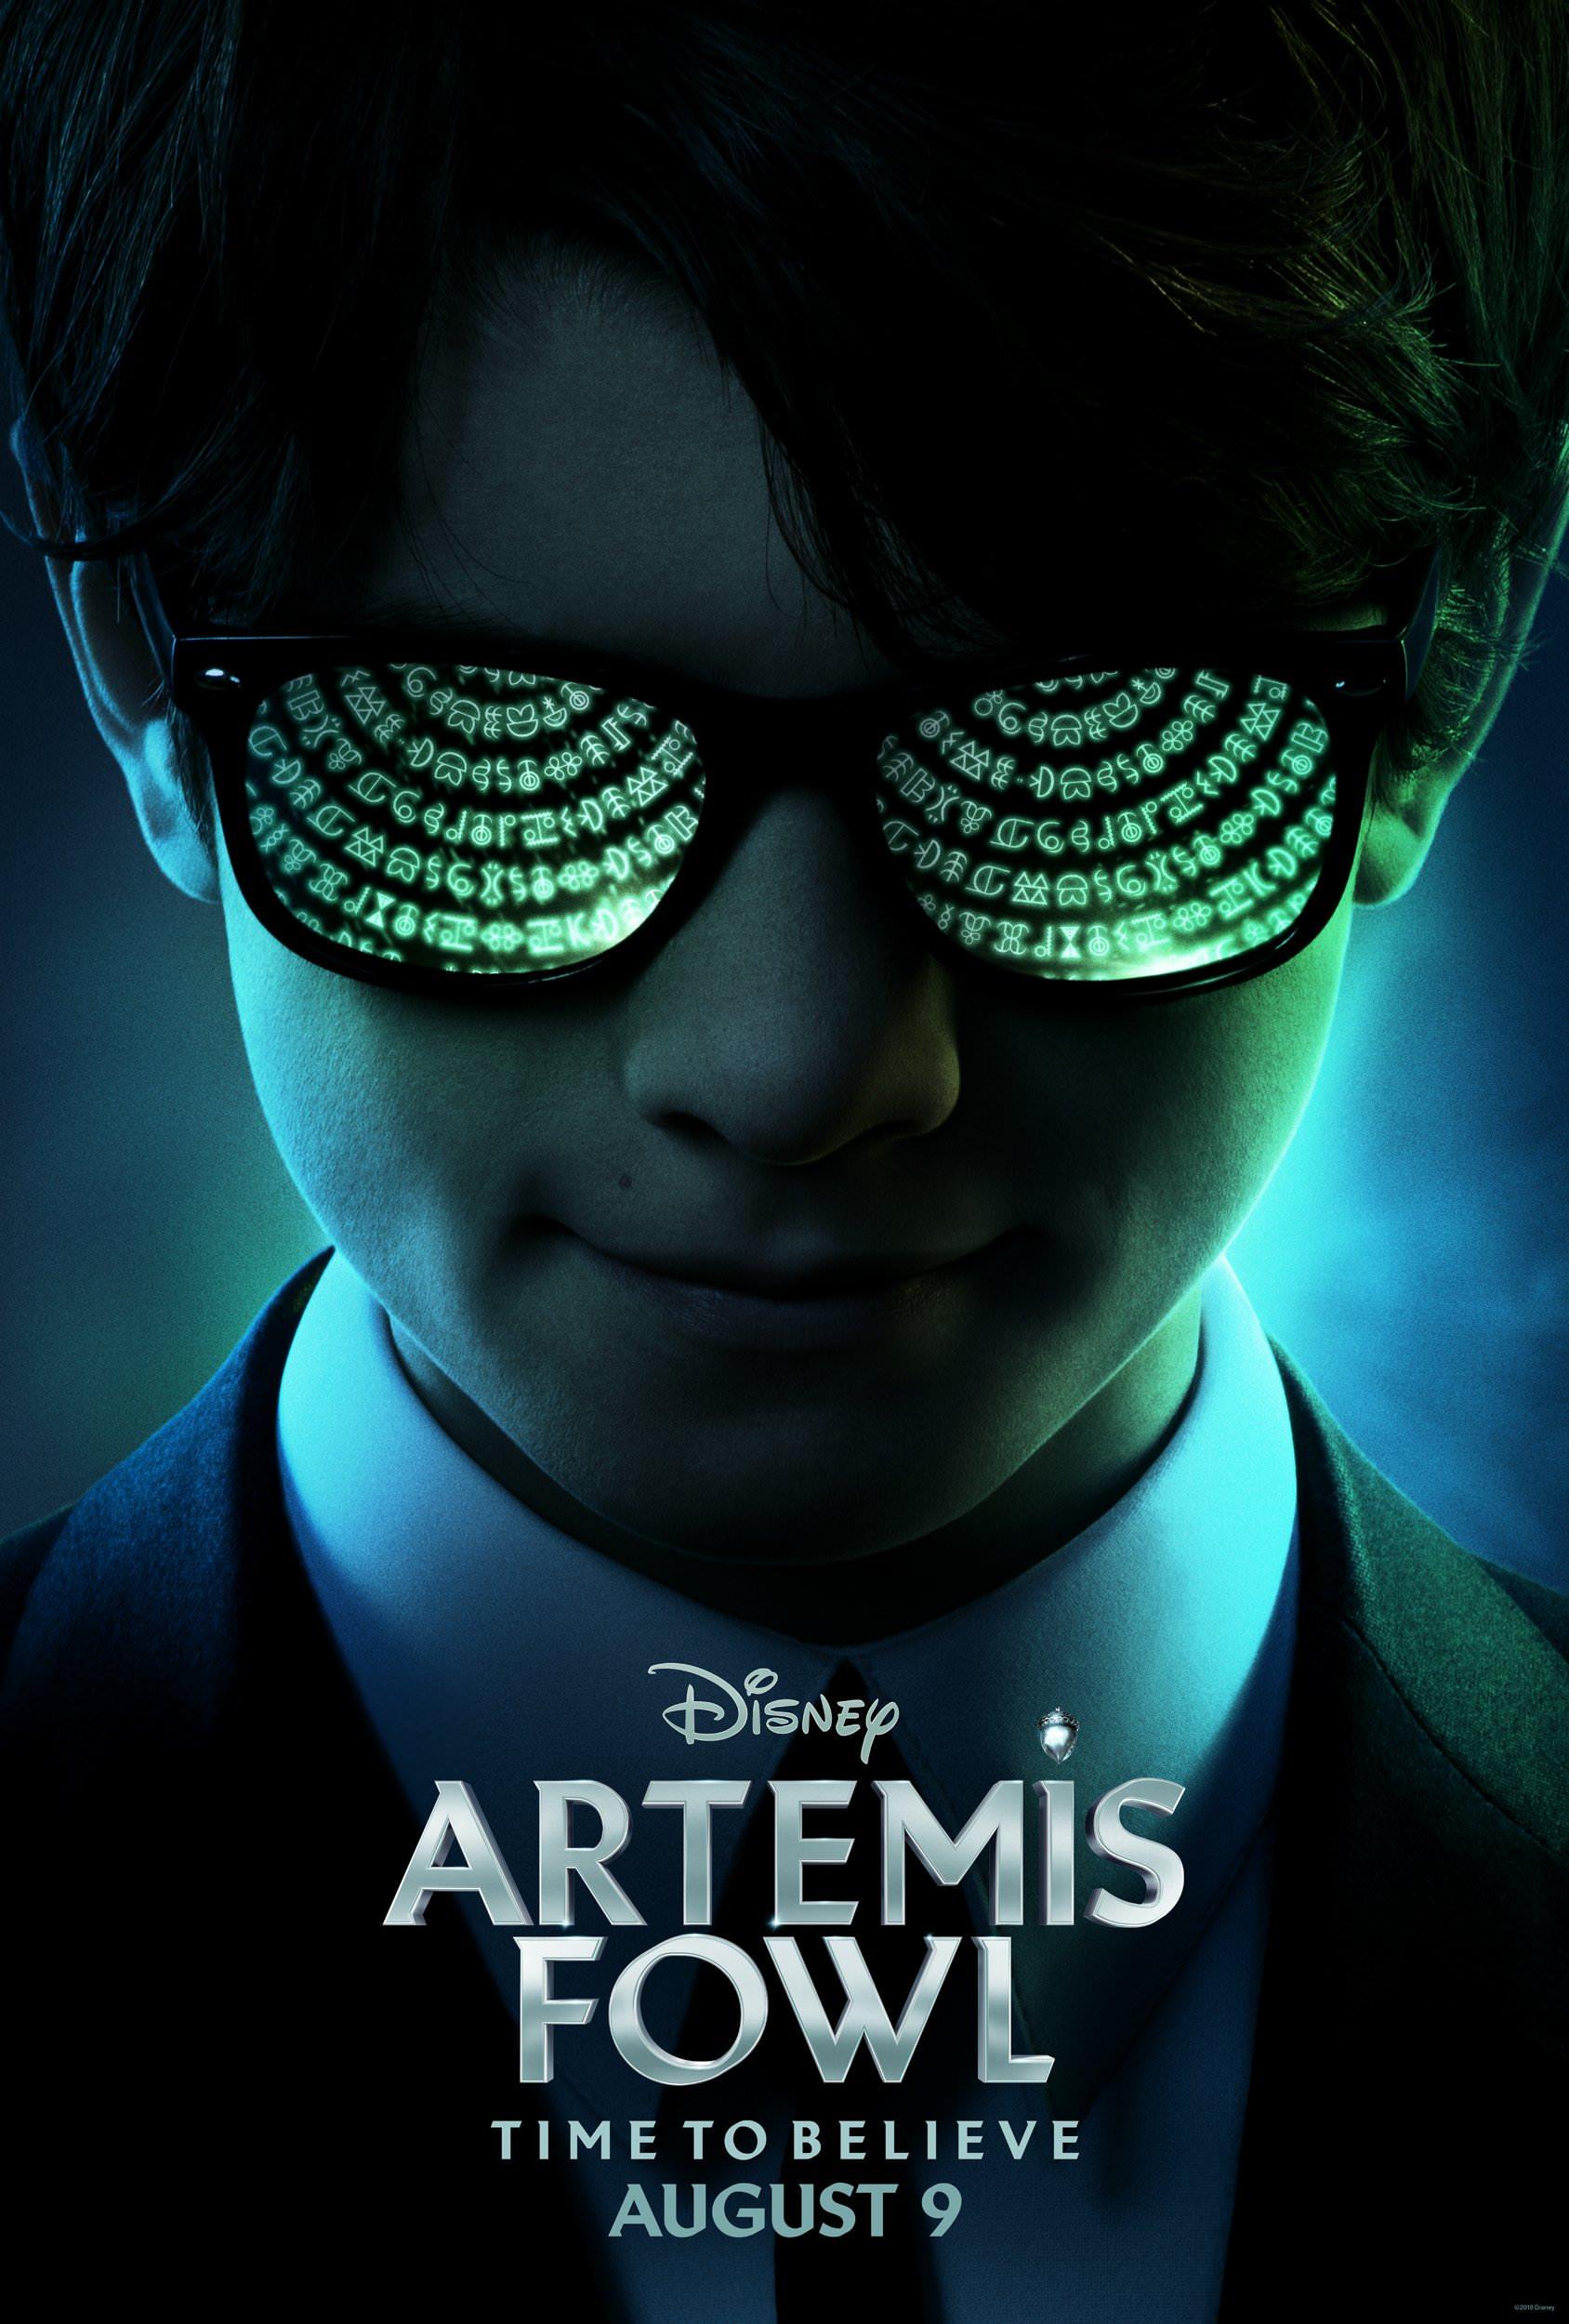 Artemis Fowl Disney trailer